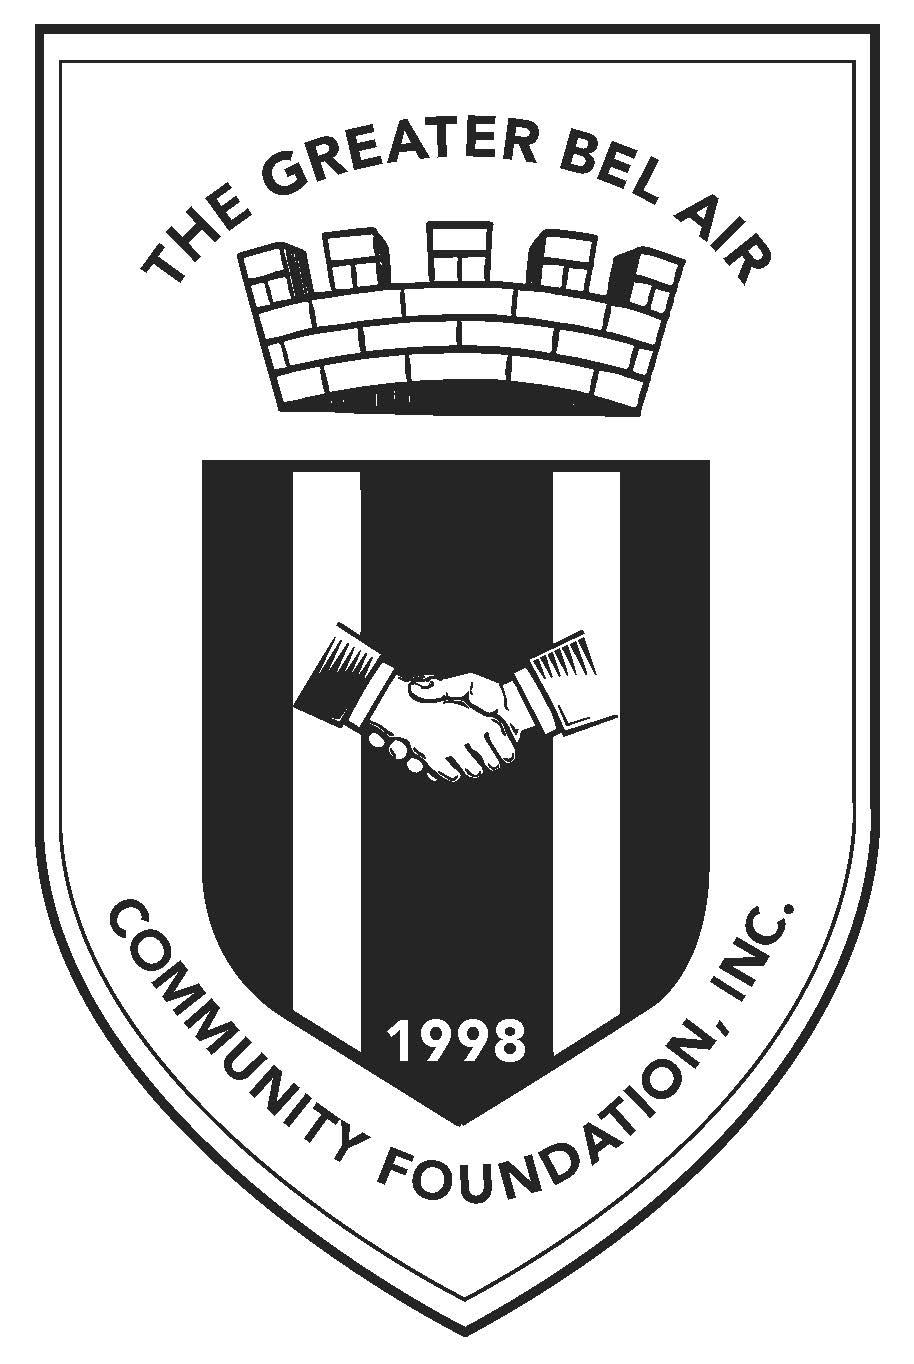 19th Annual Greater Bel Air Community Foundation, Inc. logo